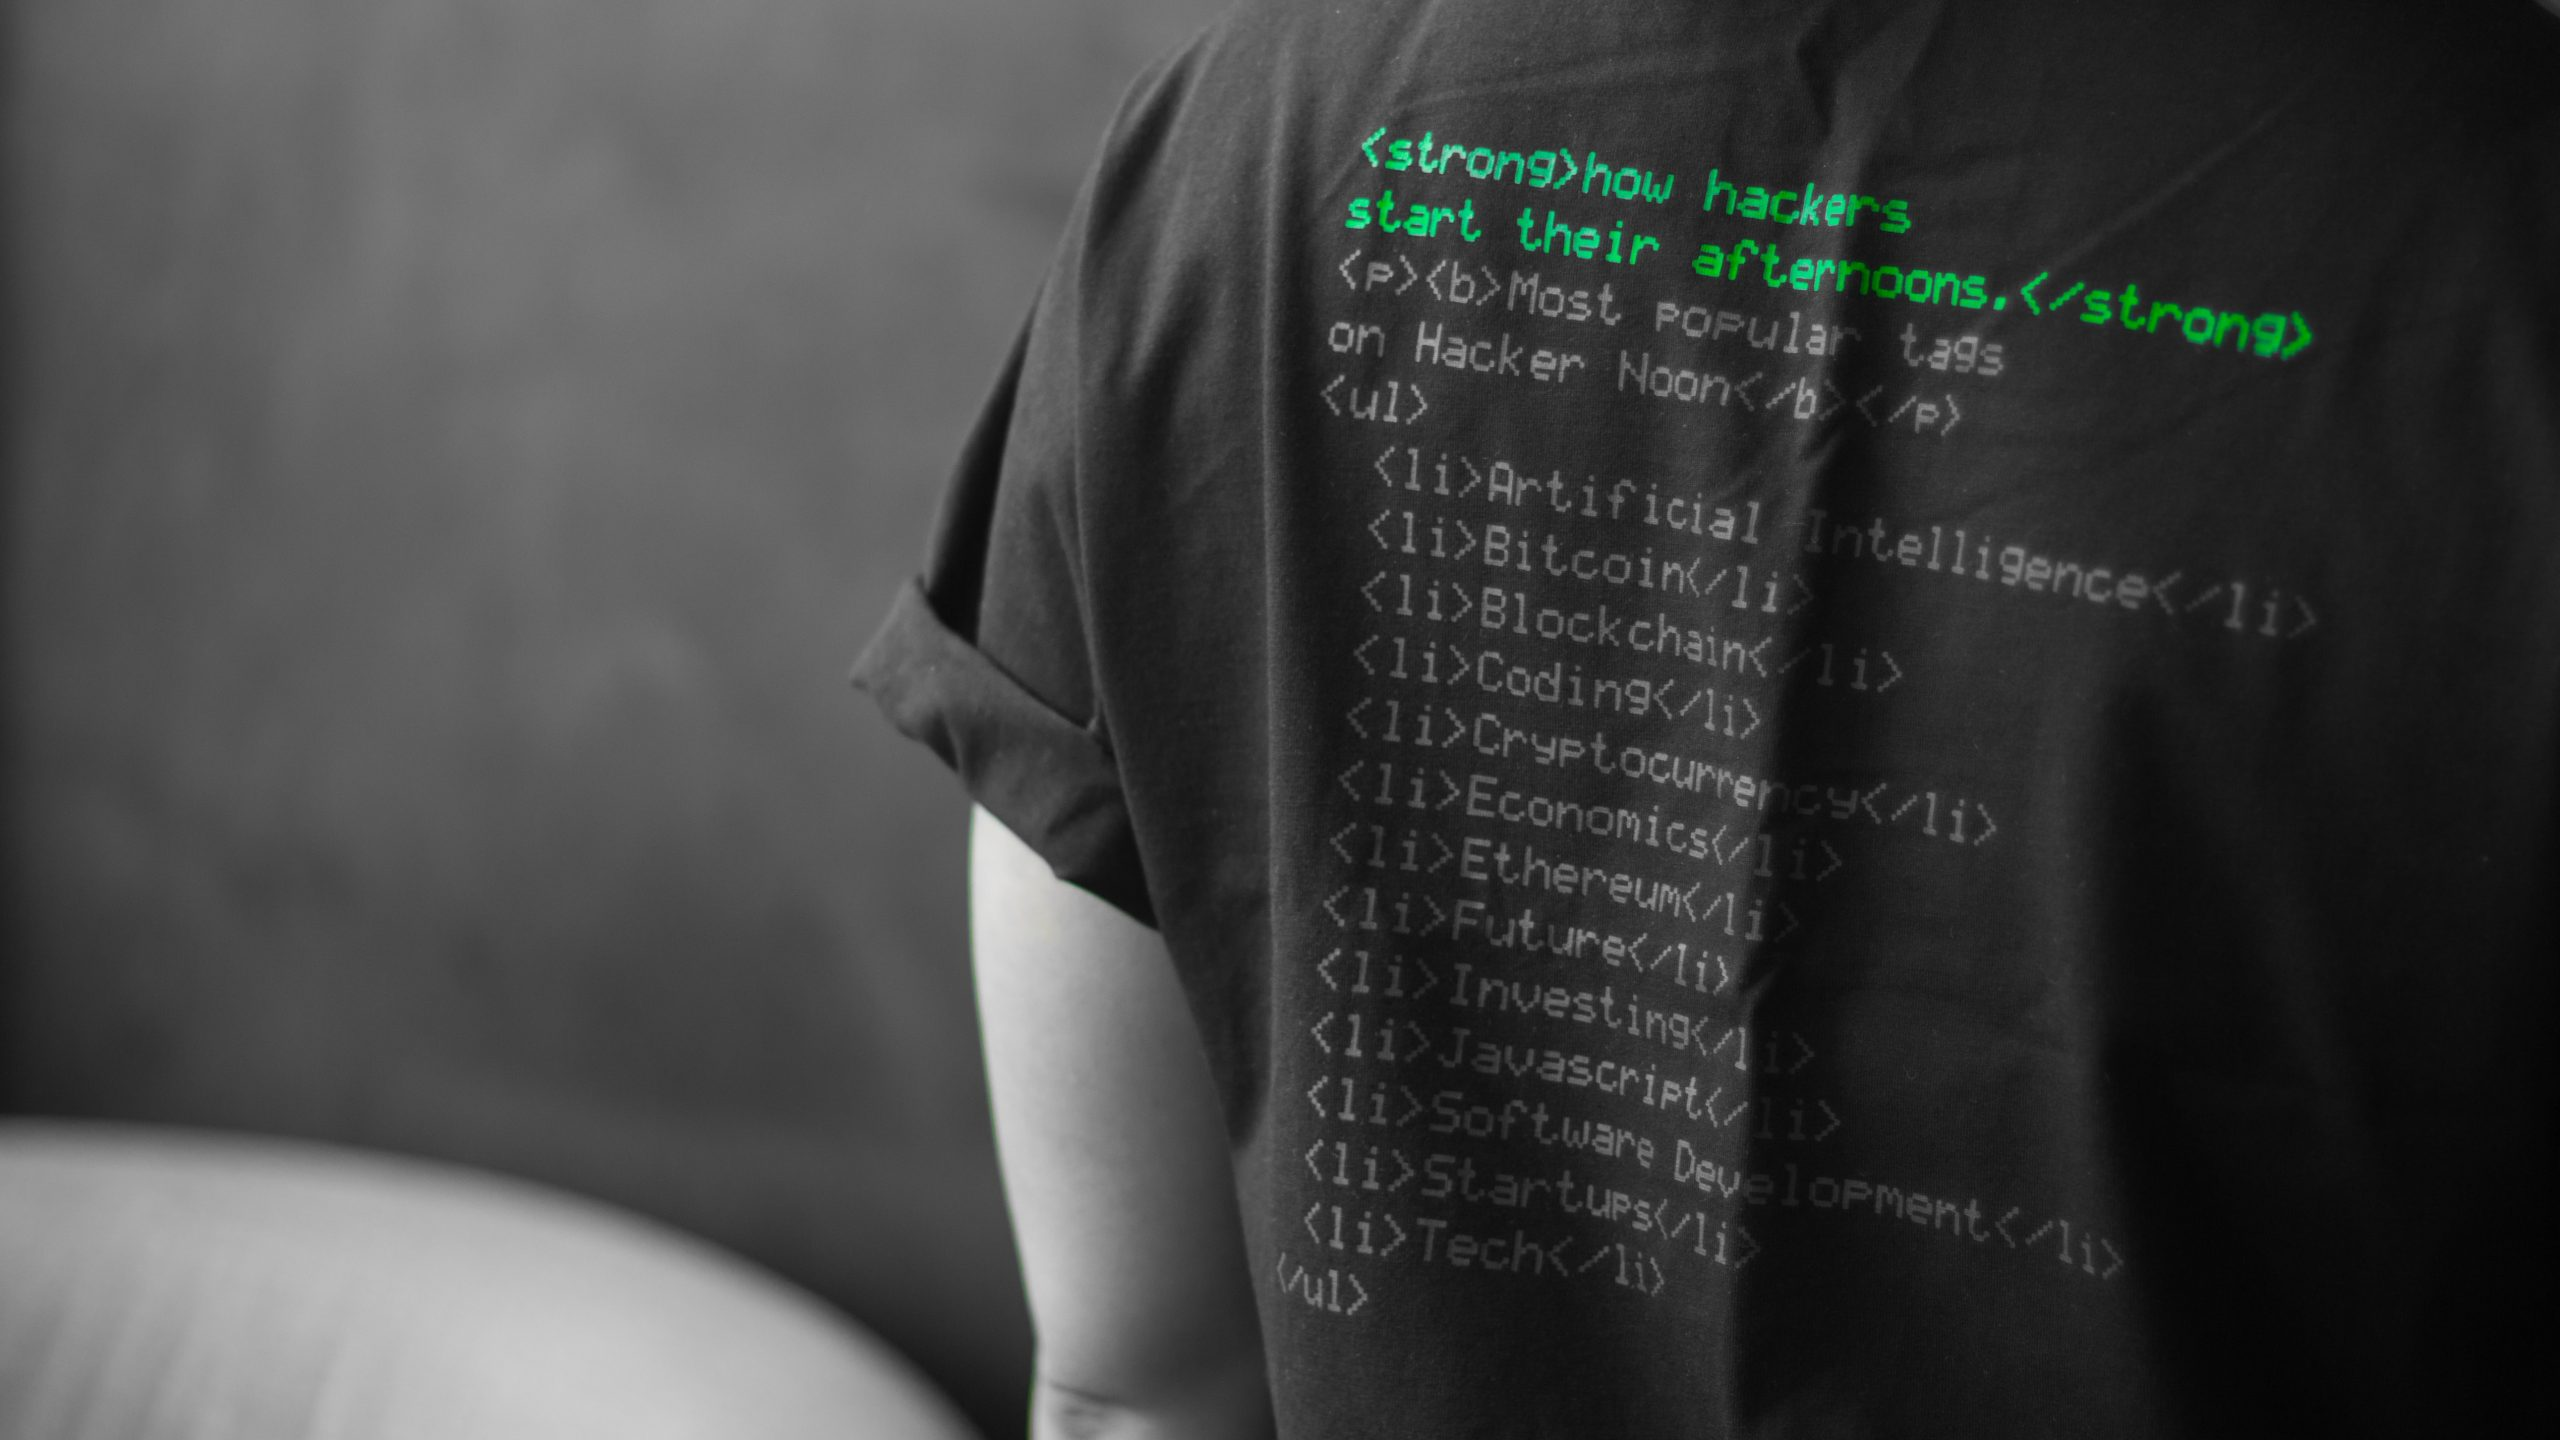 Hacker PC Virus Ataque Ransomware REvil tshirt code